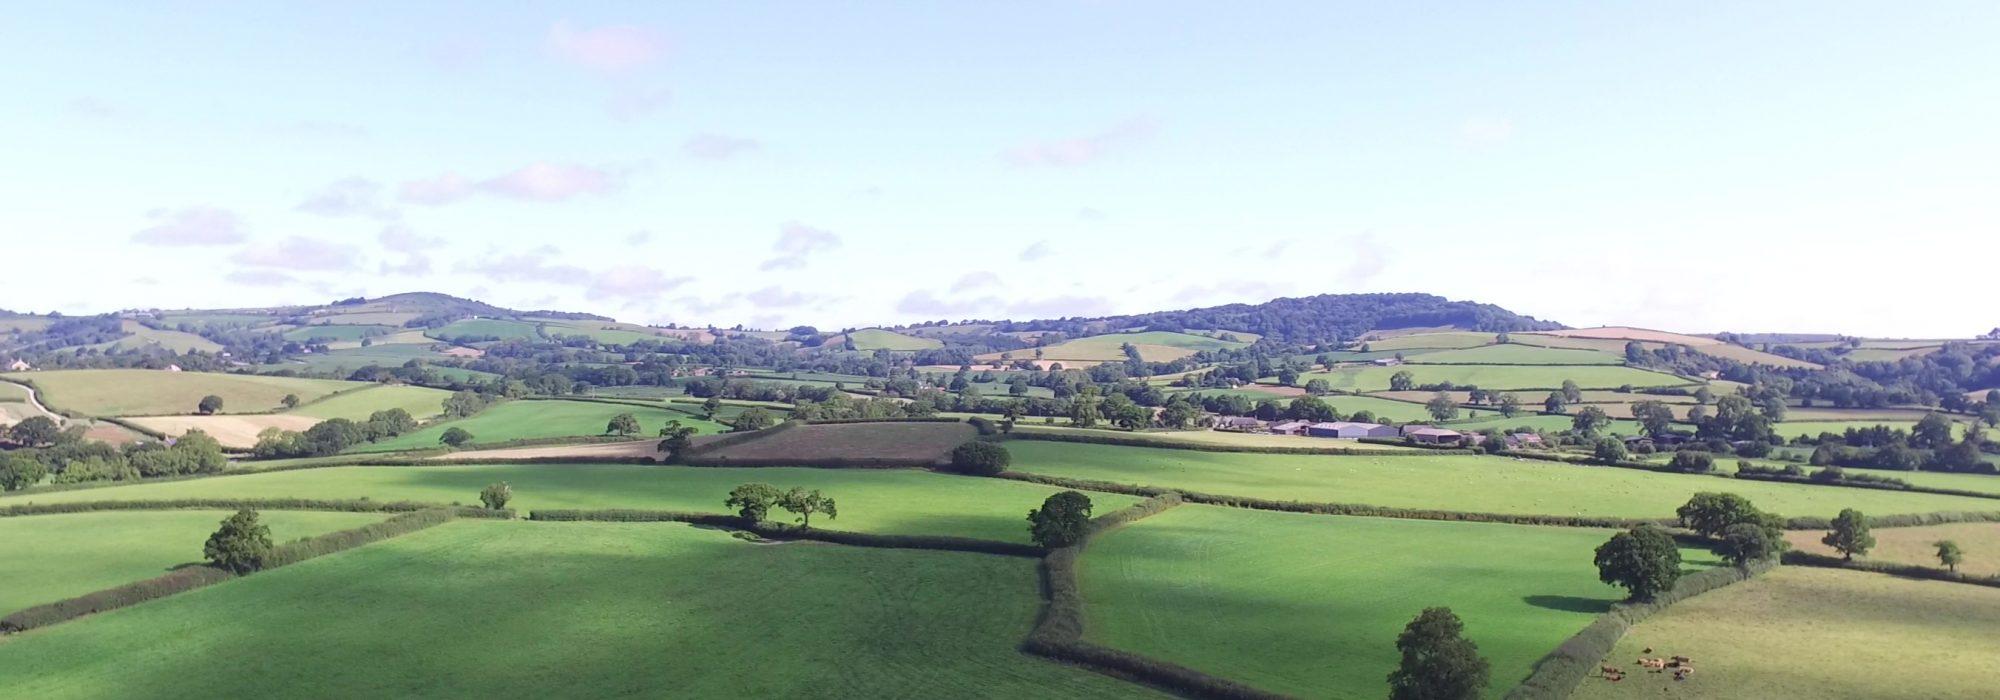 countryside photo 2